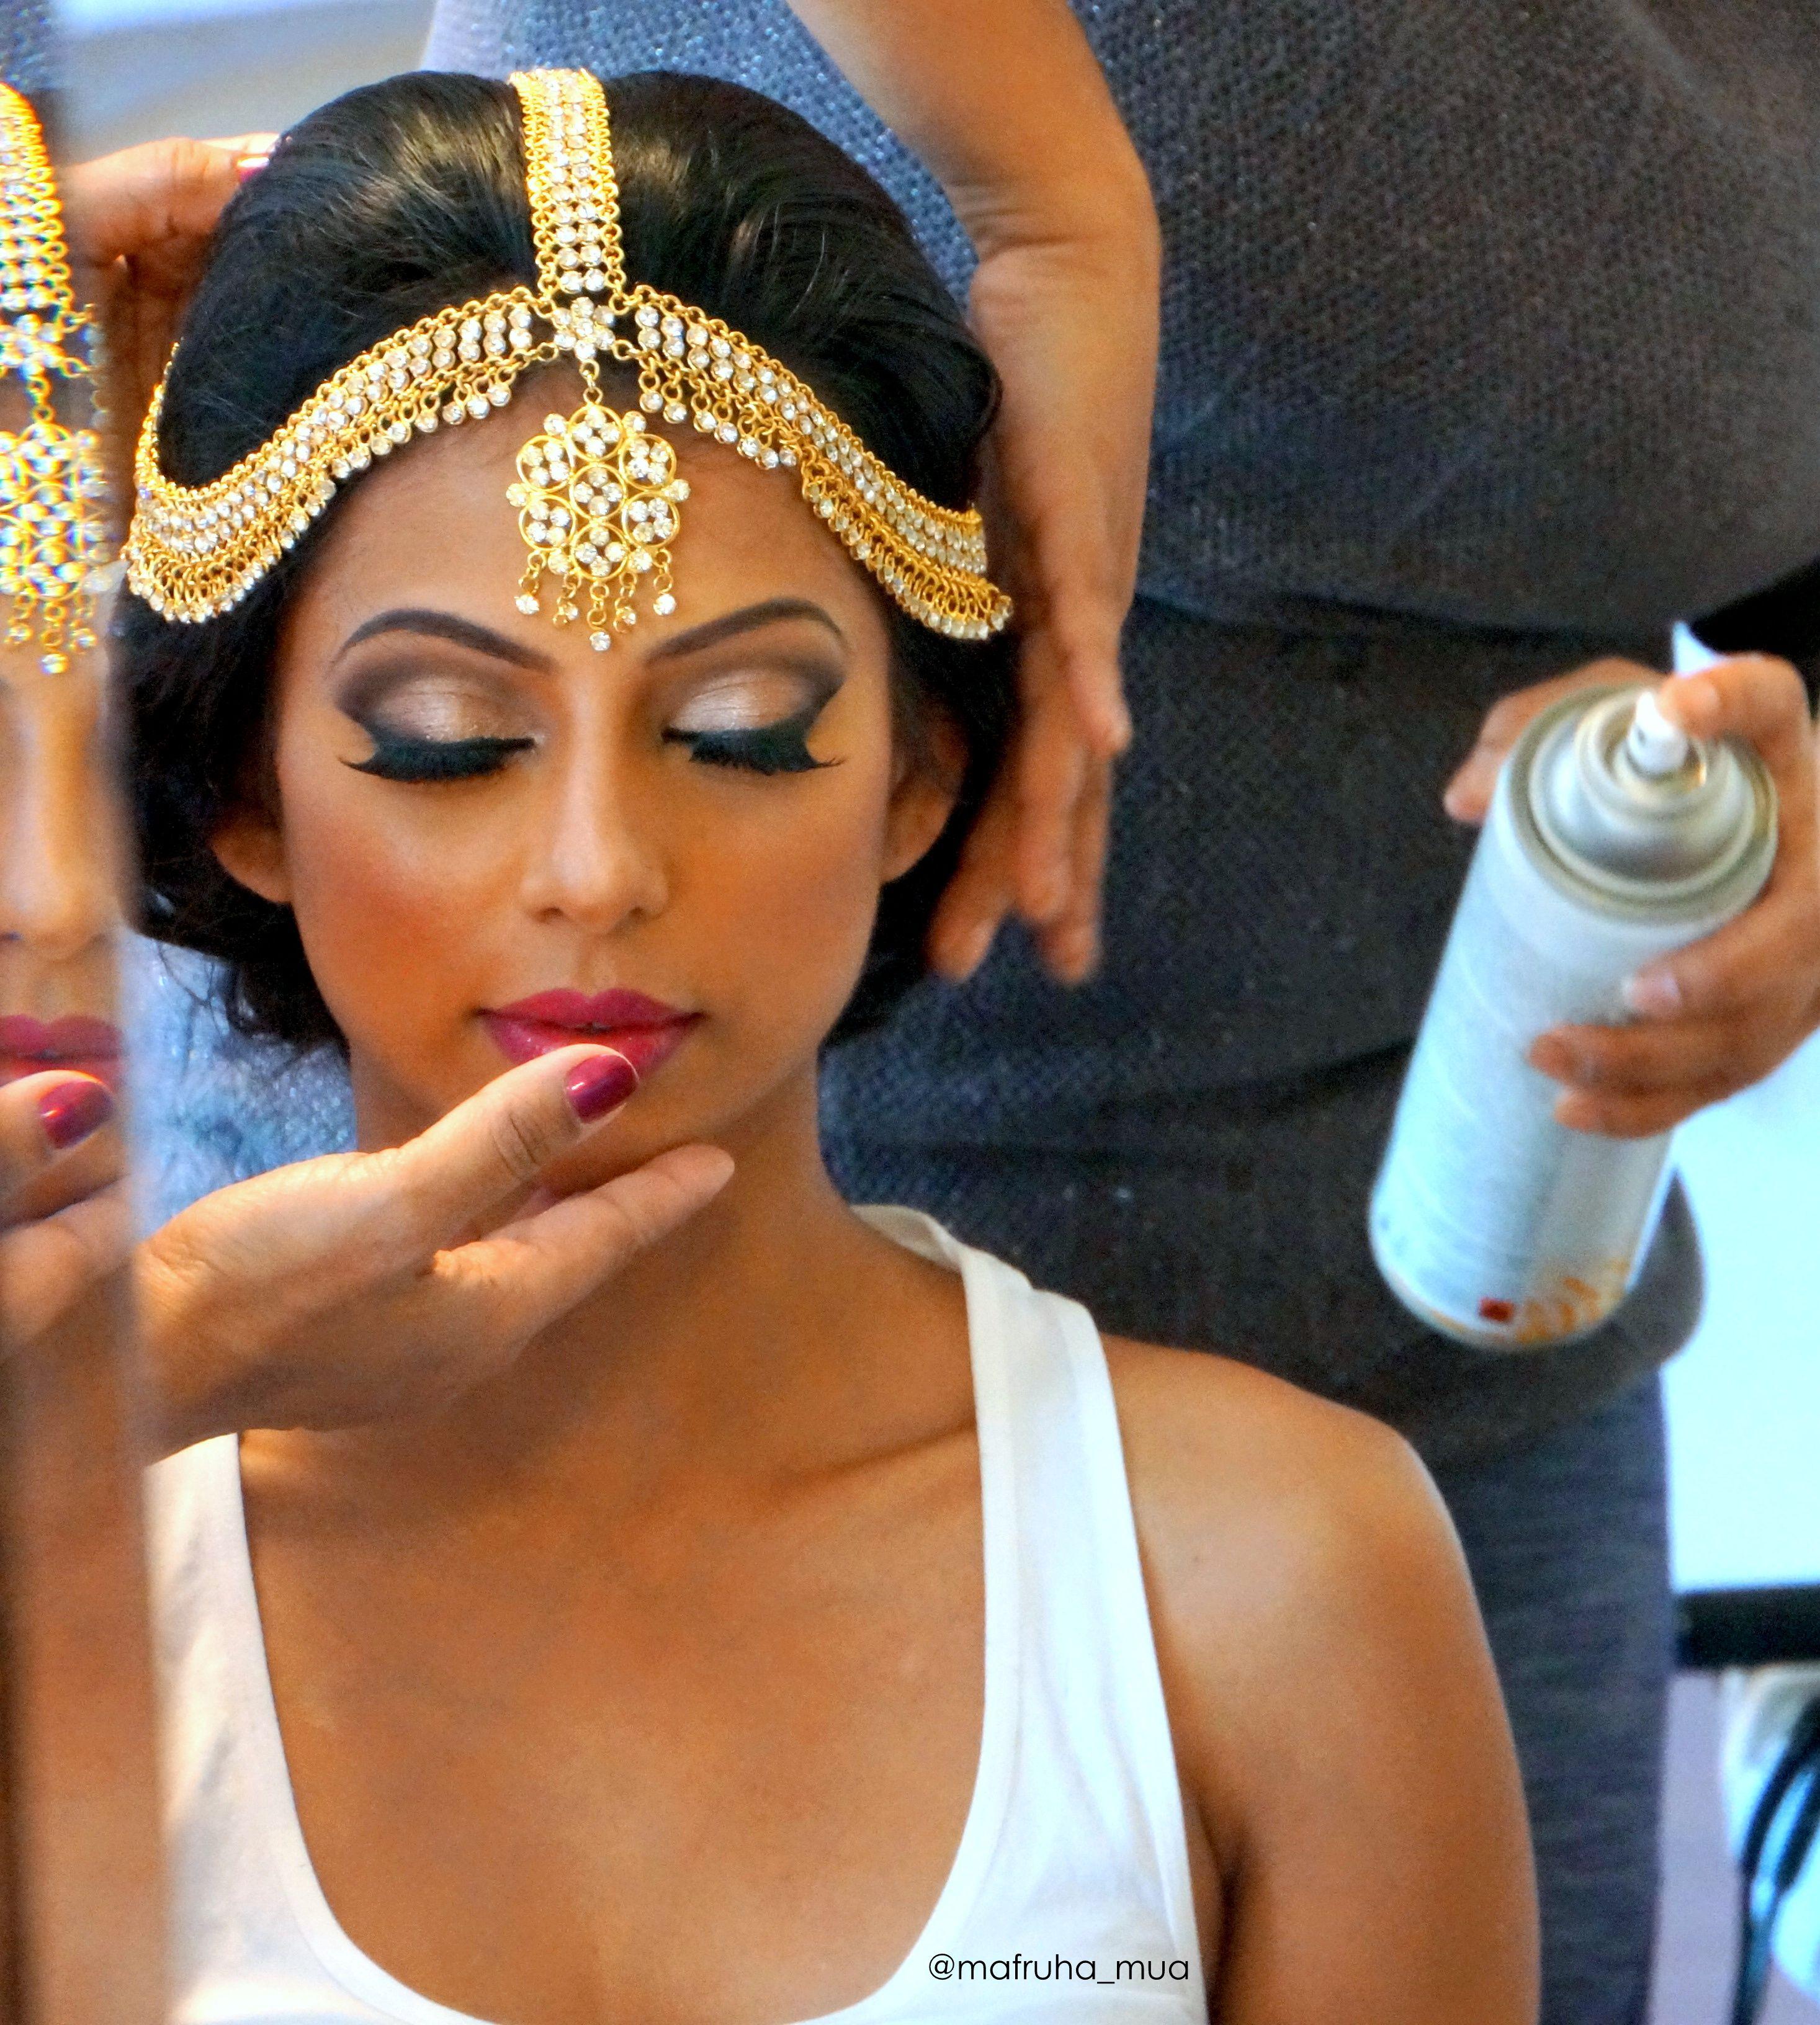 Makeup And Hair For This Beautiful Srilanken Bride Bride Wedding Mua Makeupartist T Indian Bride Makeup Bridal Hair And Makeup South Asian Wedding Makeup